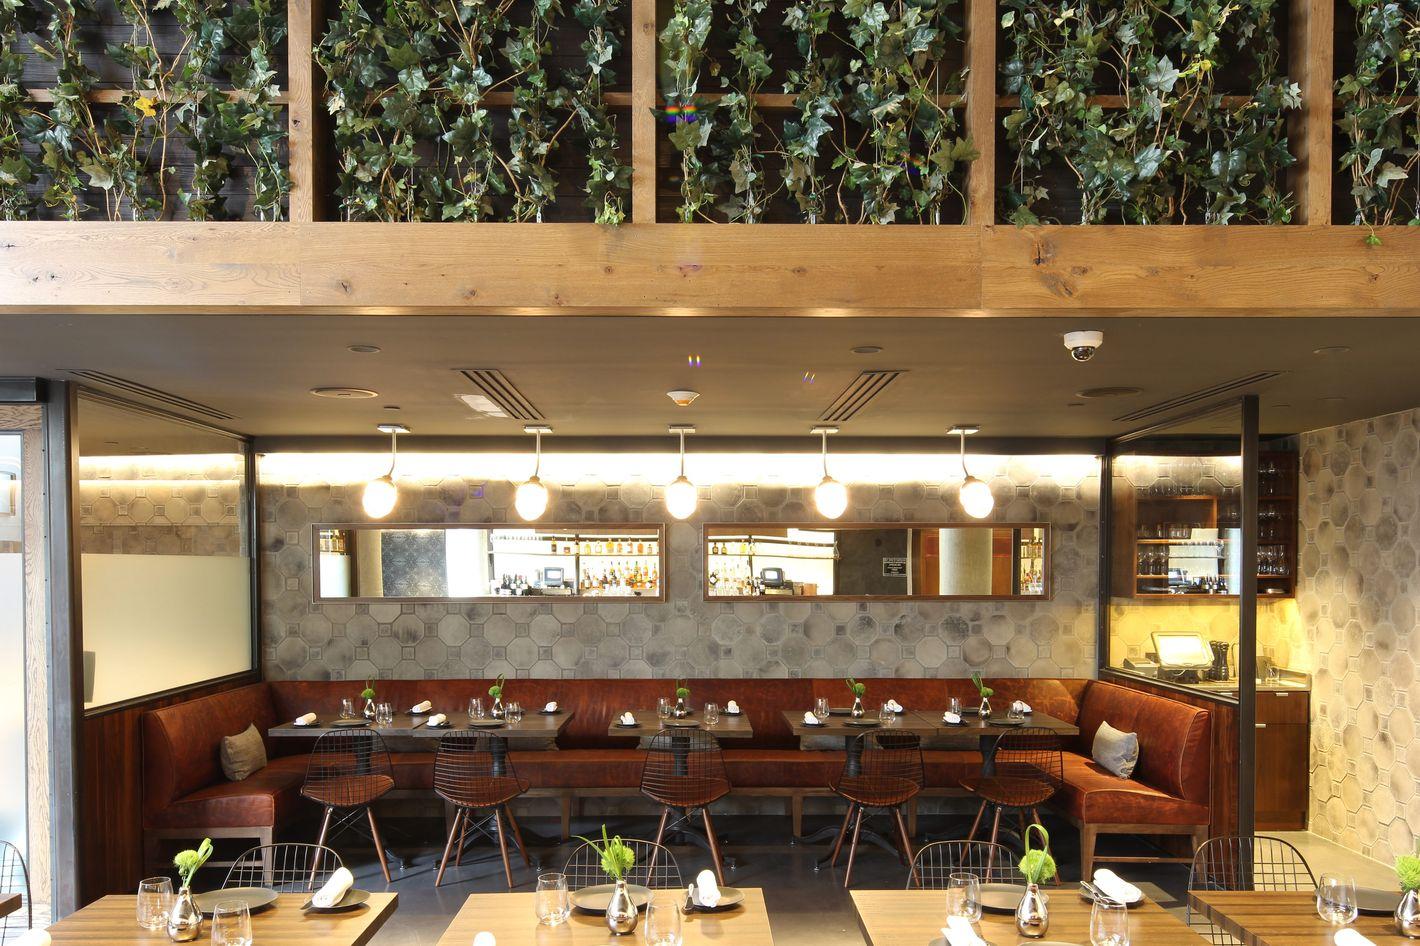 Sushi Nakazawa Carbone Top New York Em Times 10 Best Restaurants Of 2017 List